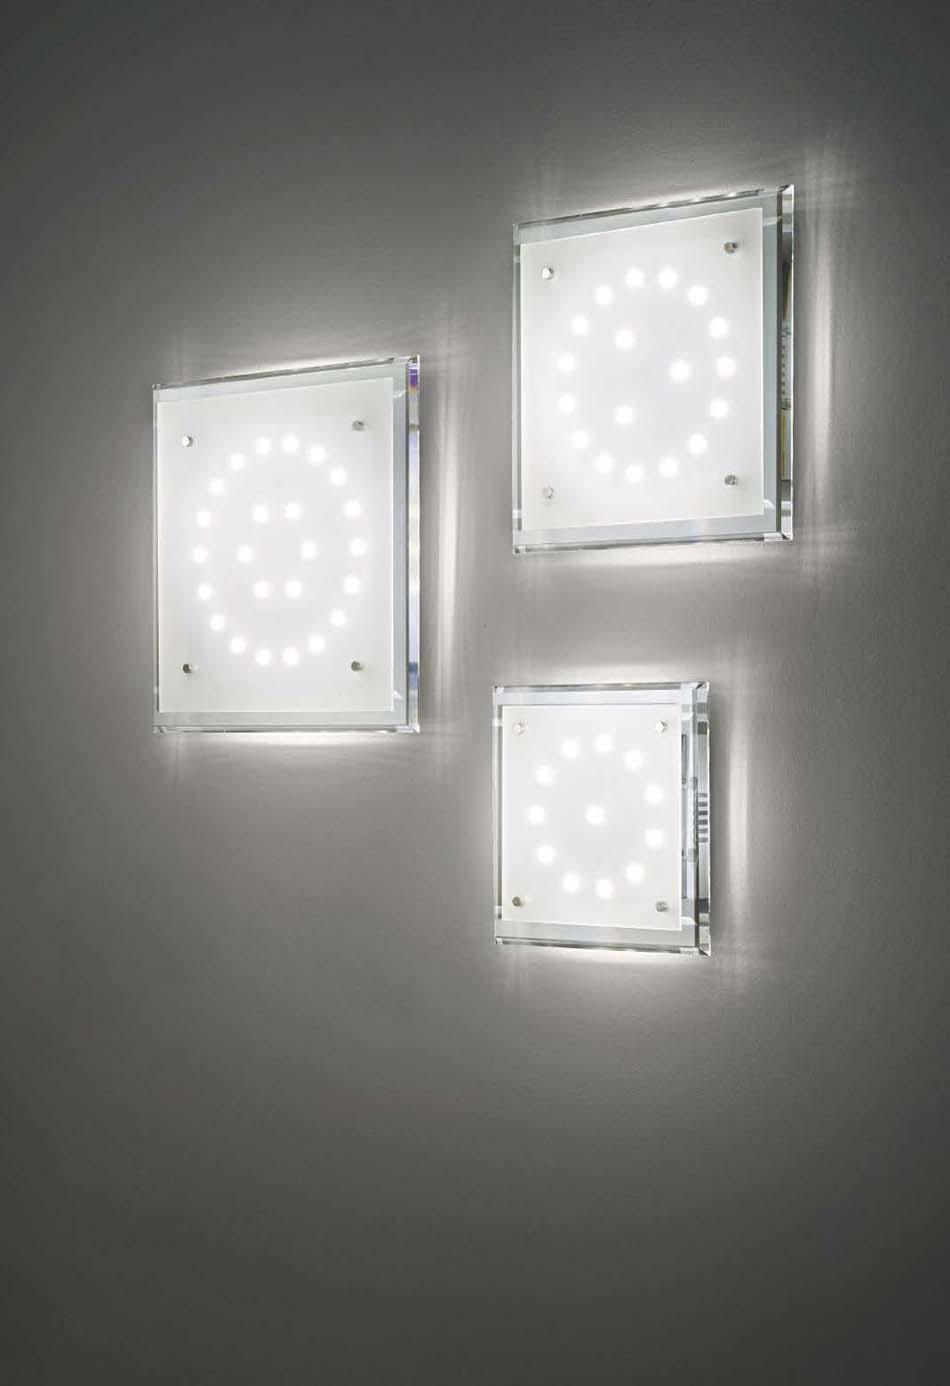 Lampade sospensione Ideal Lux Pacific – Bruni Arredamenti